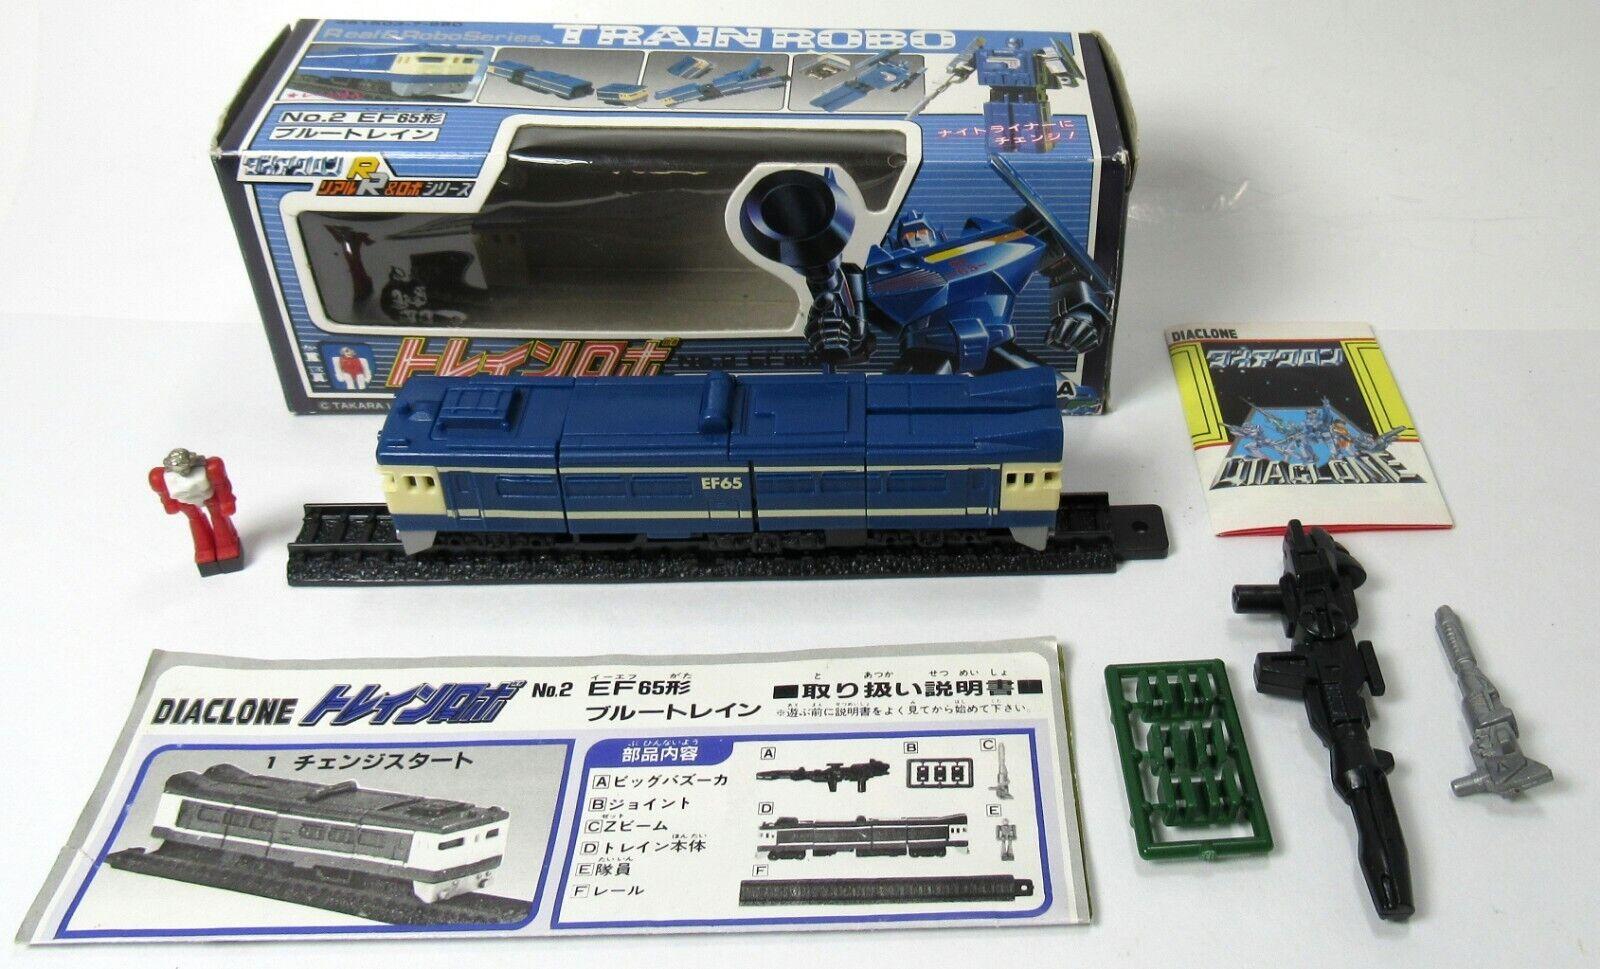 Vintage Takara Diaclone Train Robo Getsuei No.2 EF65 1980 Trainrobo With Box